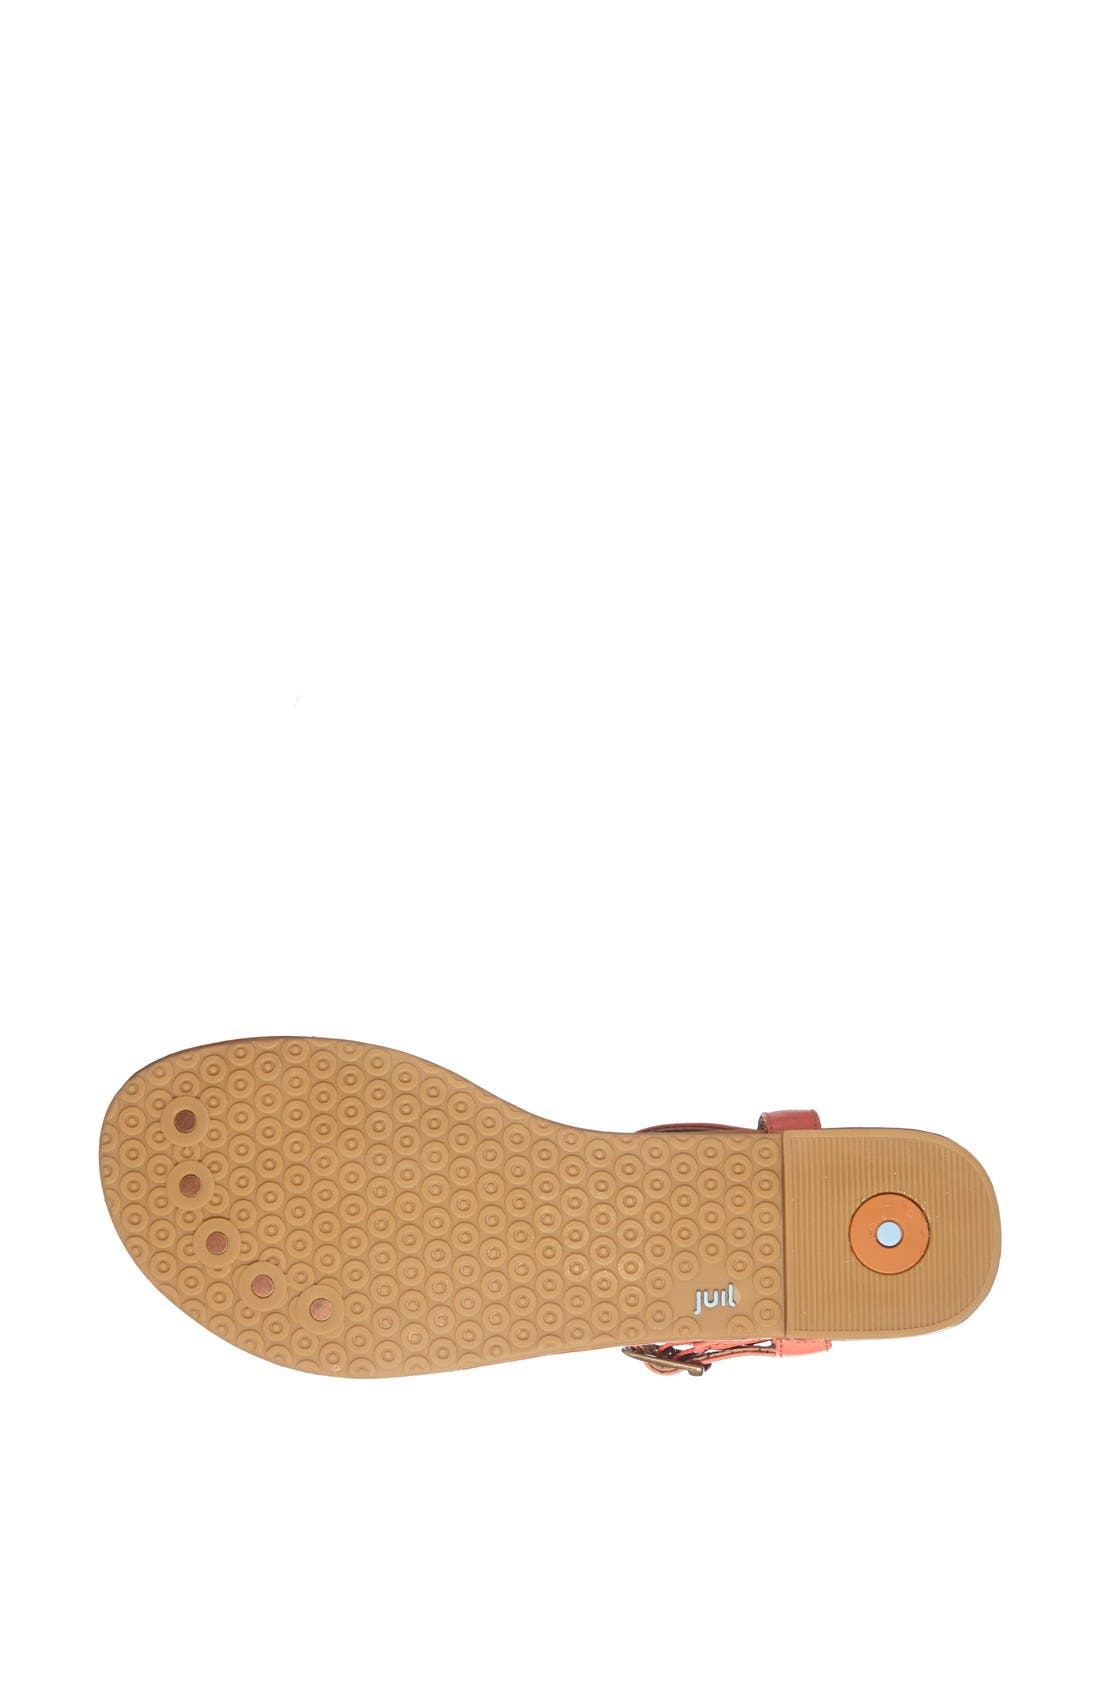 Alternate Image 4  - Juil 'Kava' Grounded Leather Sandal